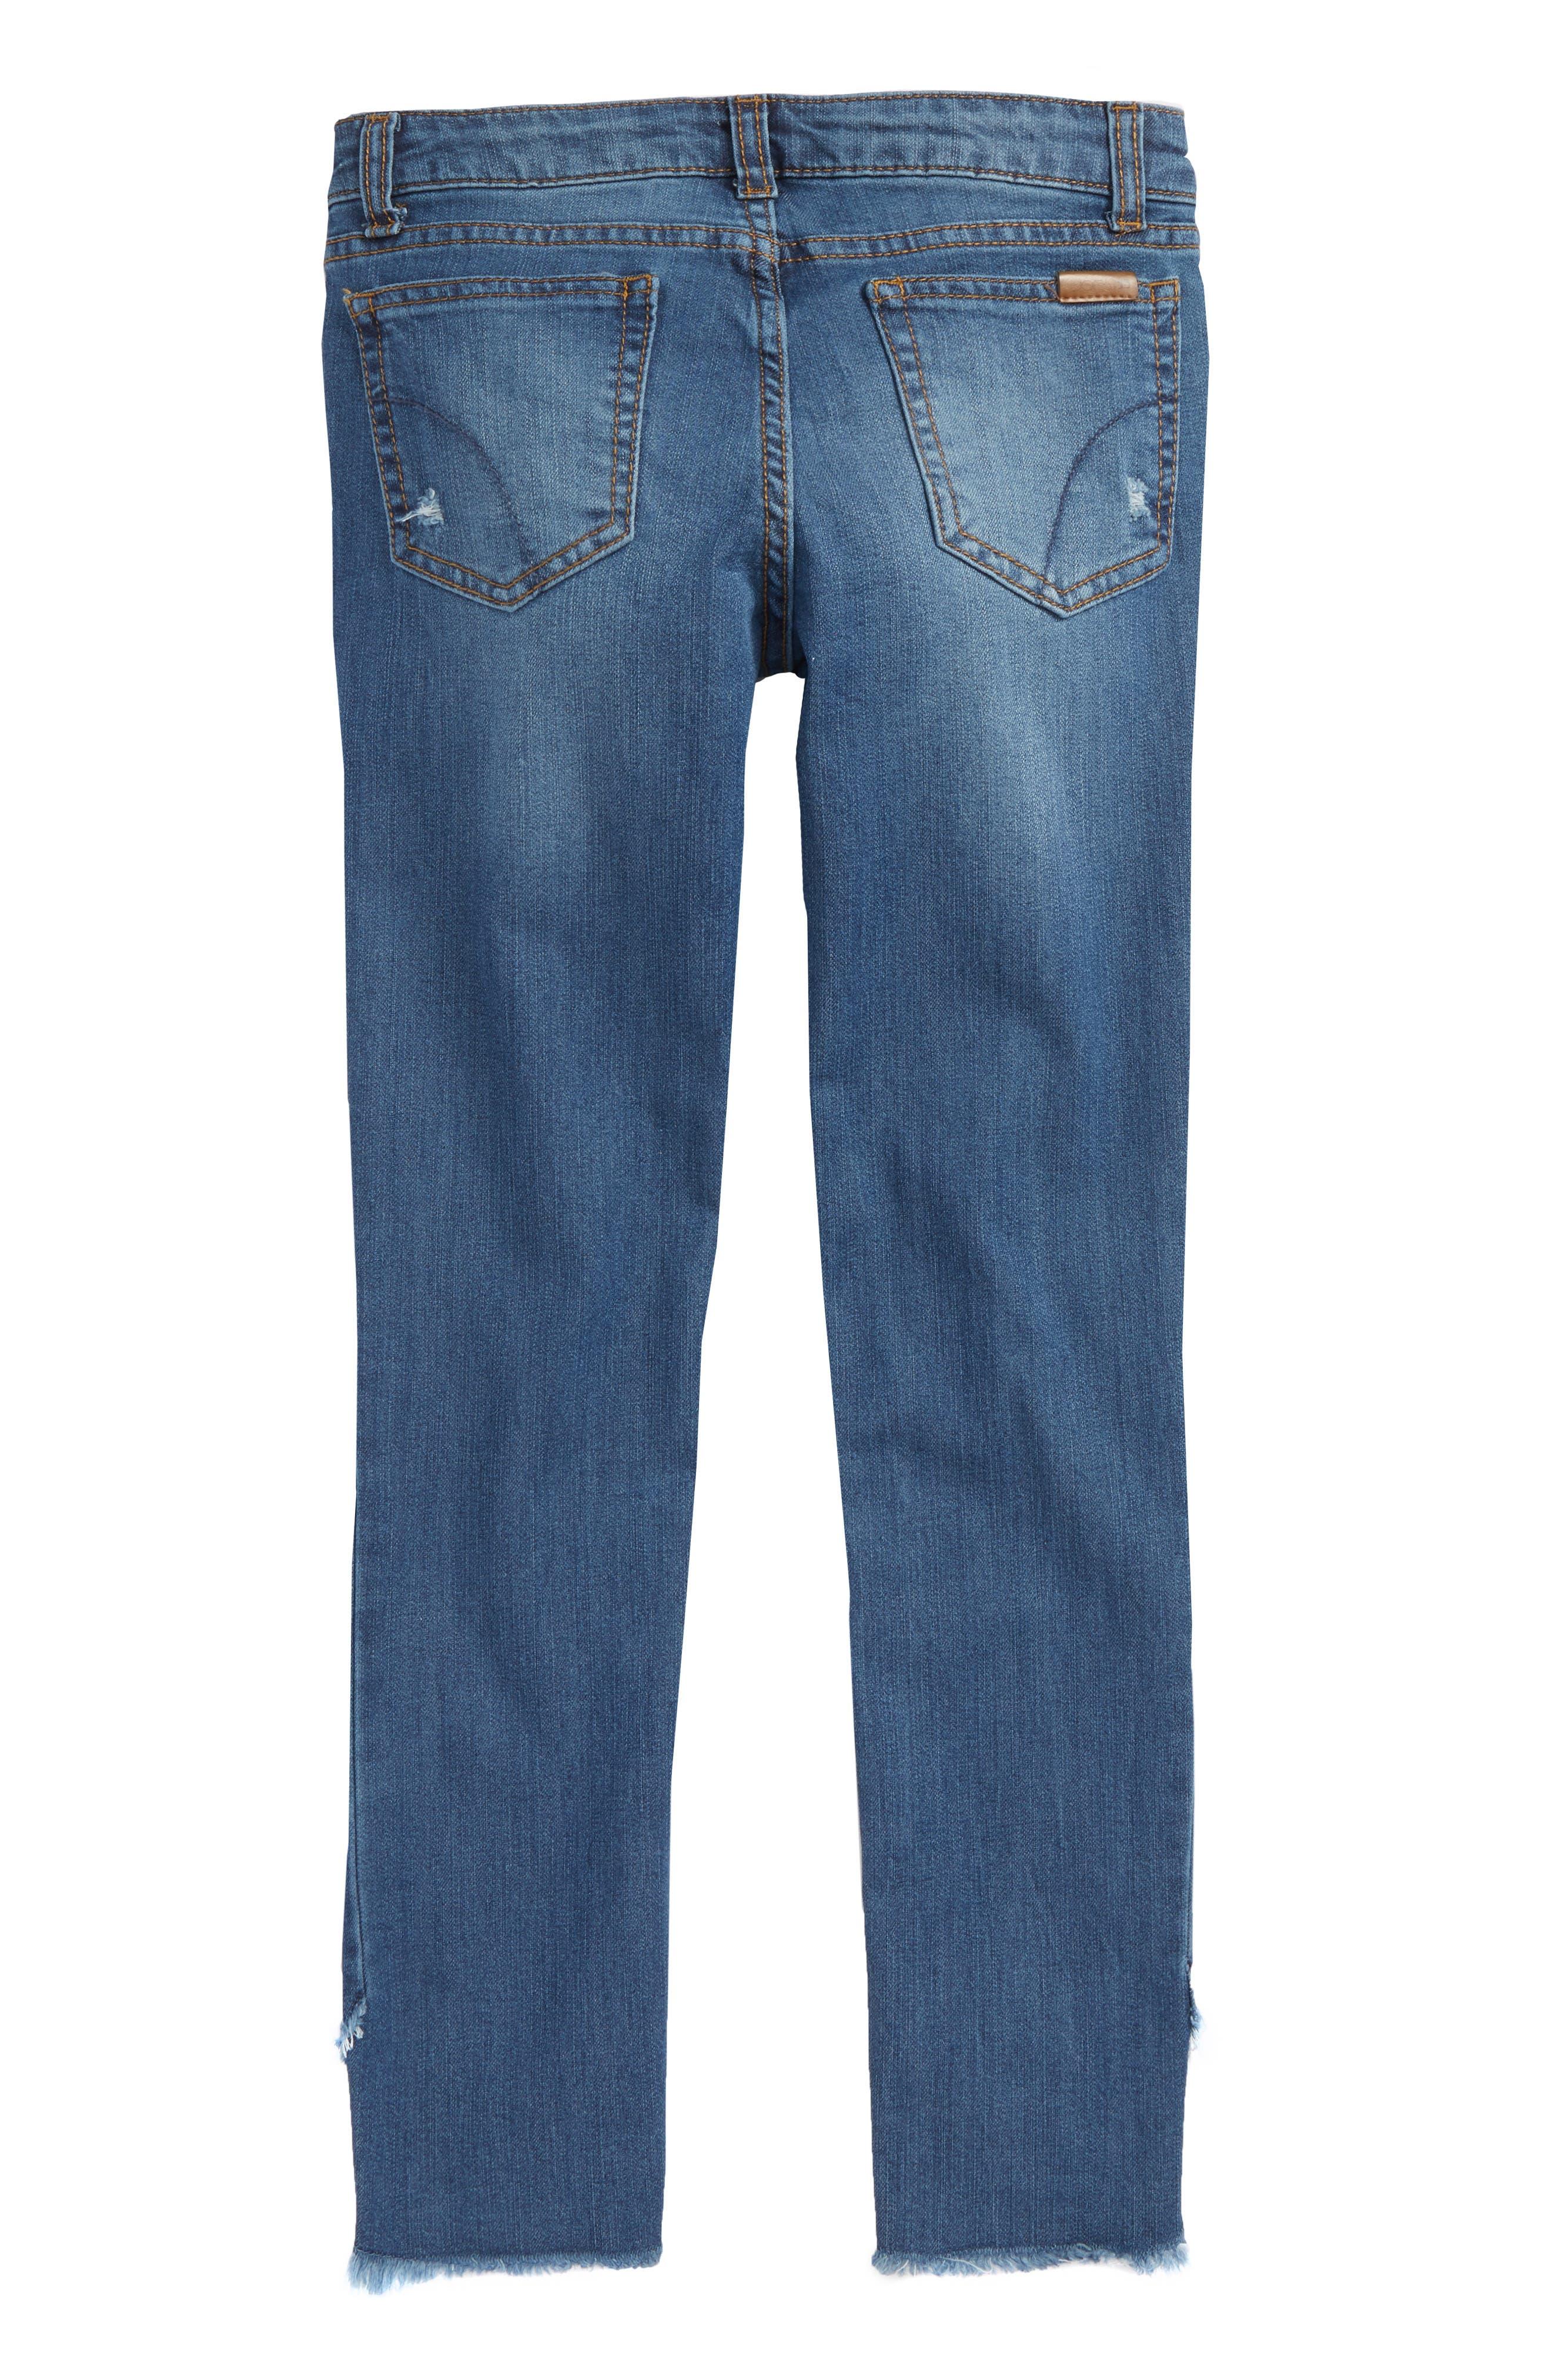 JOE'S,                             The Markie Ankle Tulip Hem Skinny Jeans,                             Alternate thumbnail 2, color,                             499